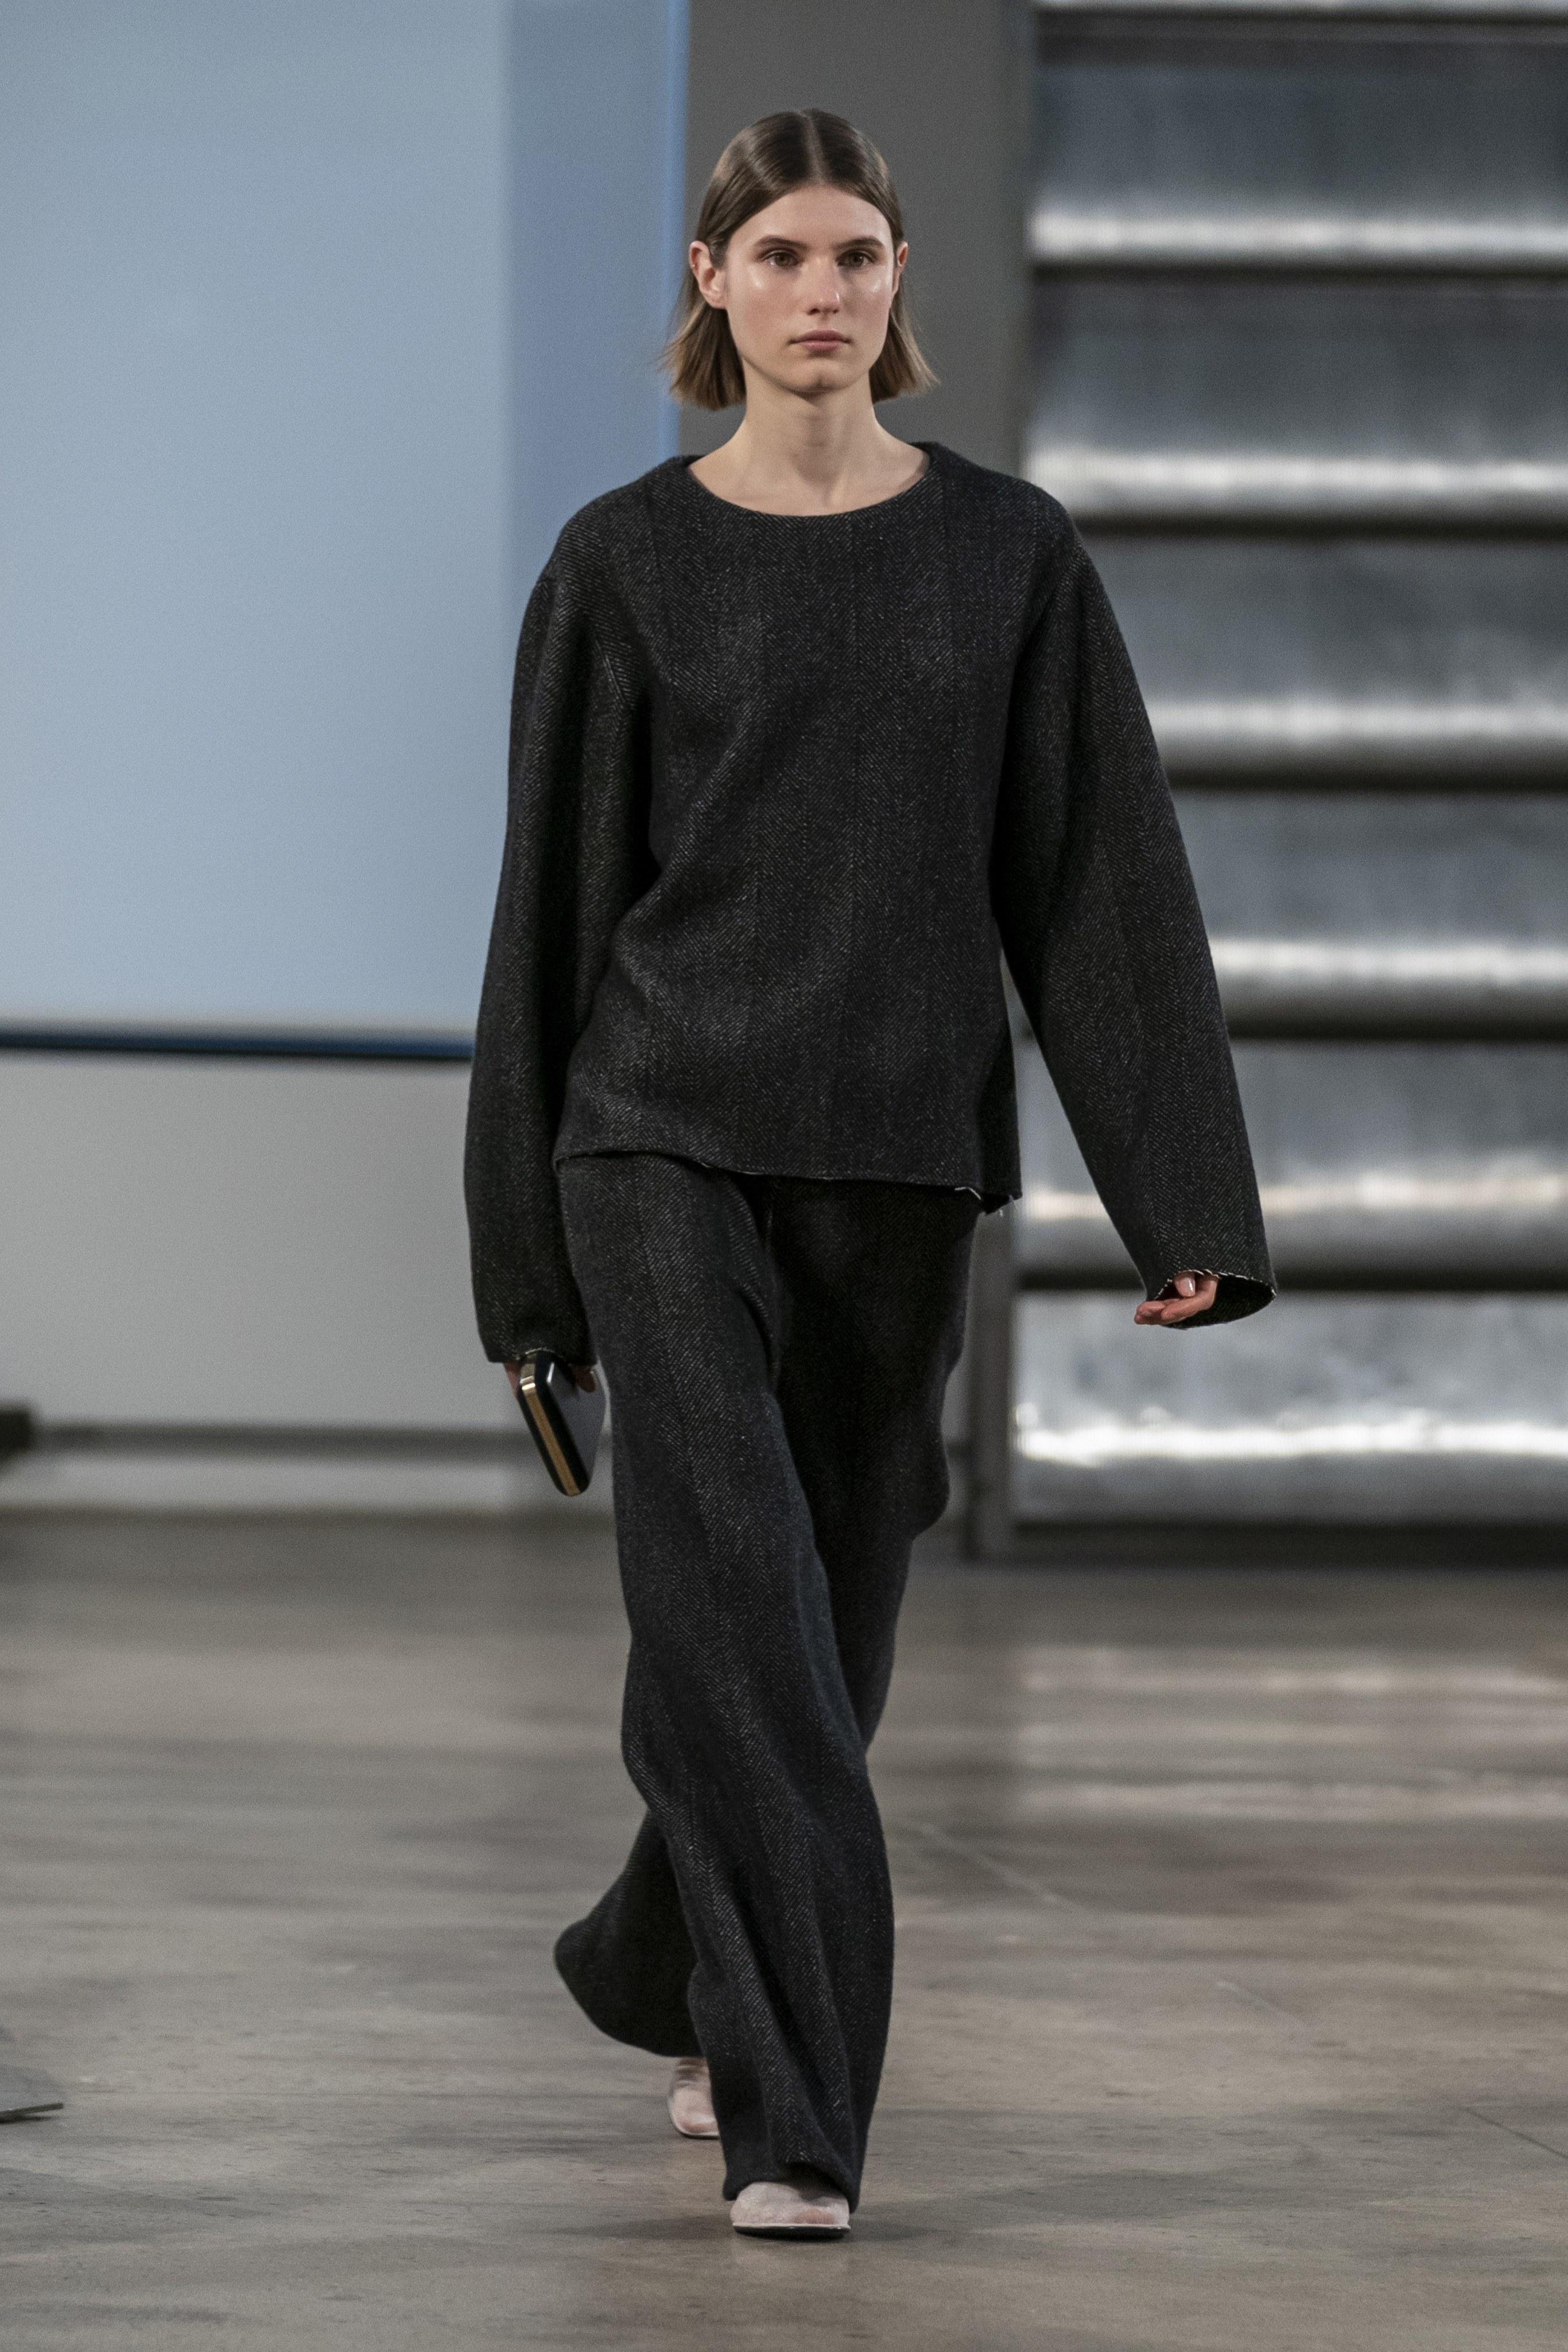 00014-The-Row-Fall-2019-ready-to-wear